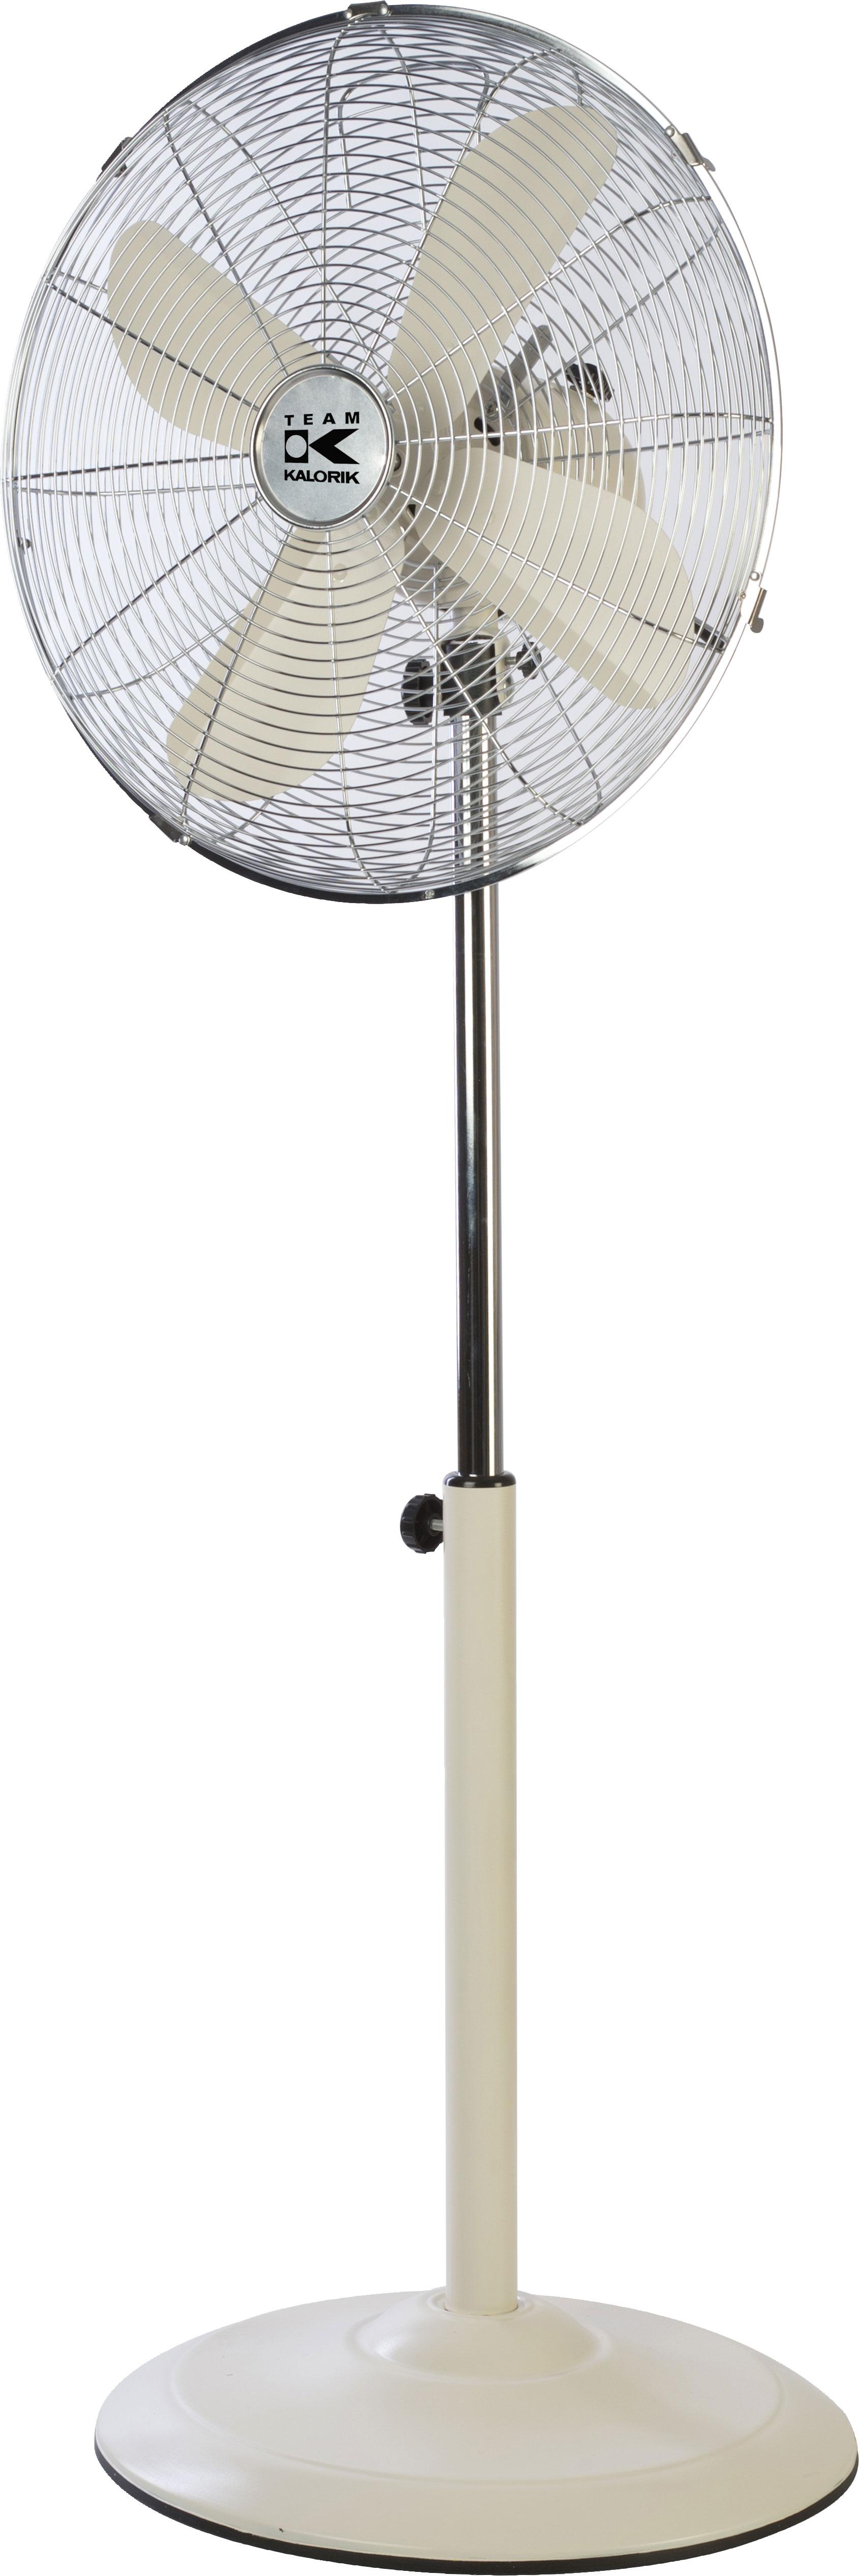 Ventilator Standgerät Metall